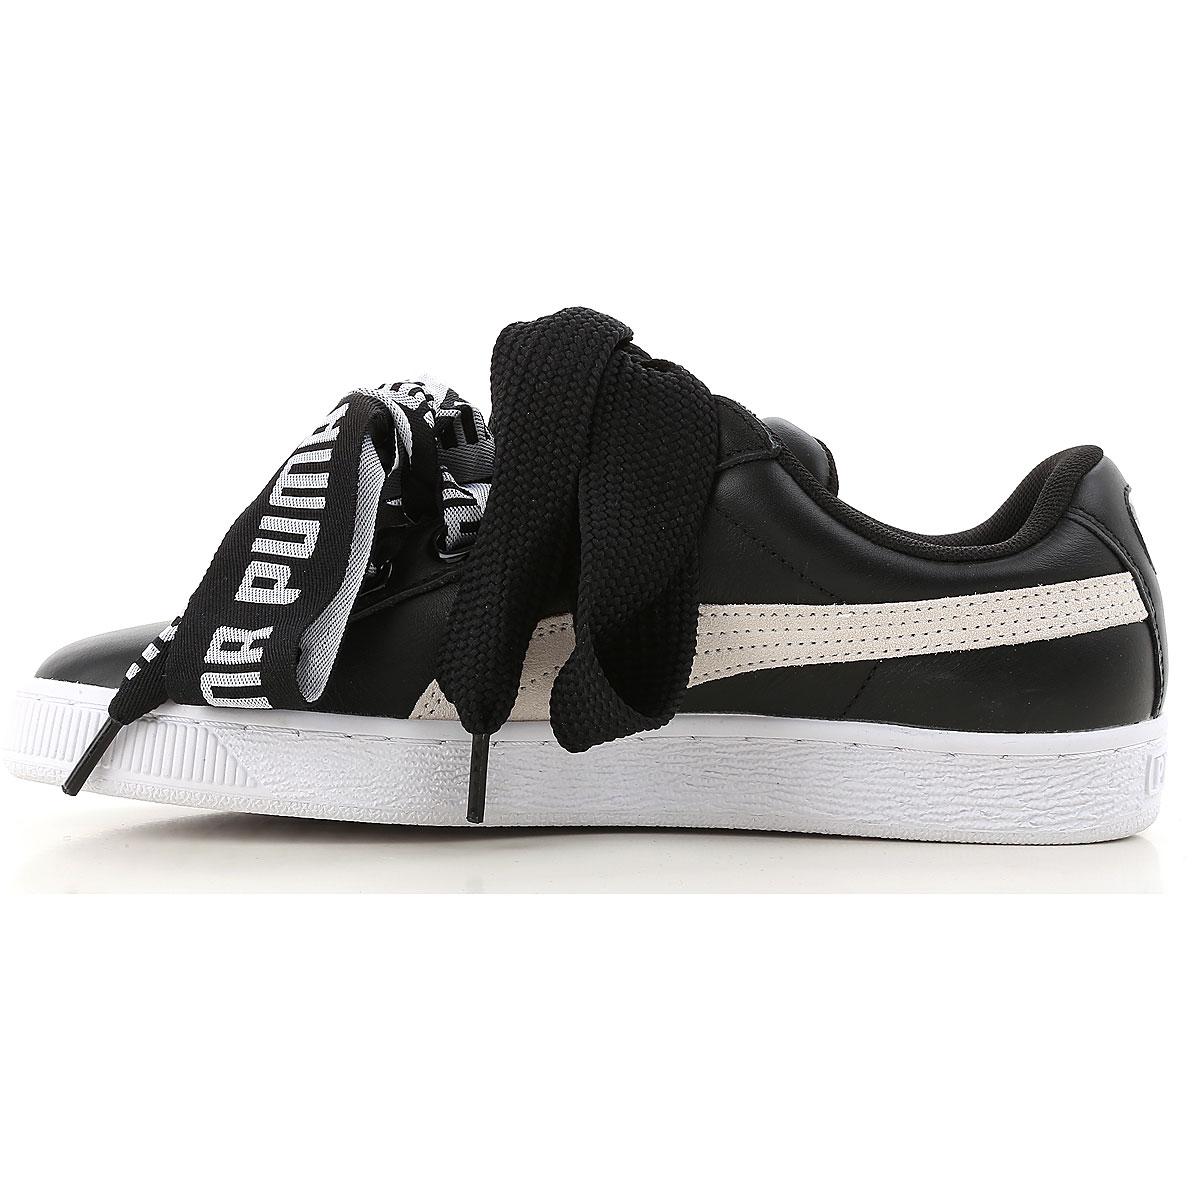 Womens Shoes Puma, Style code: 364082-01-